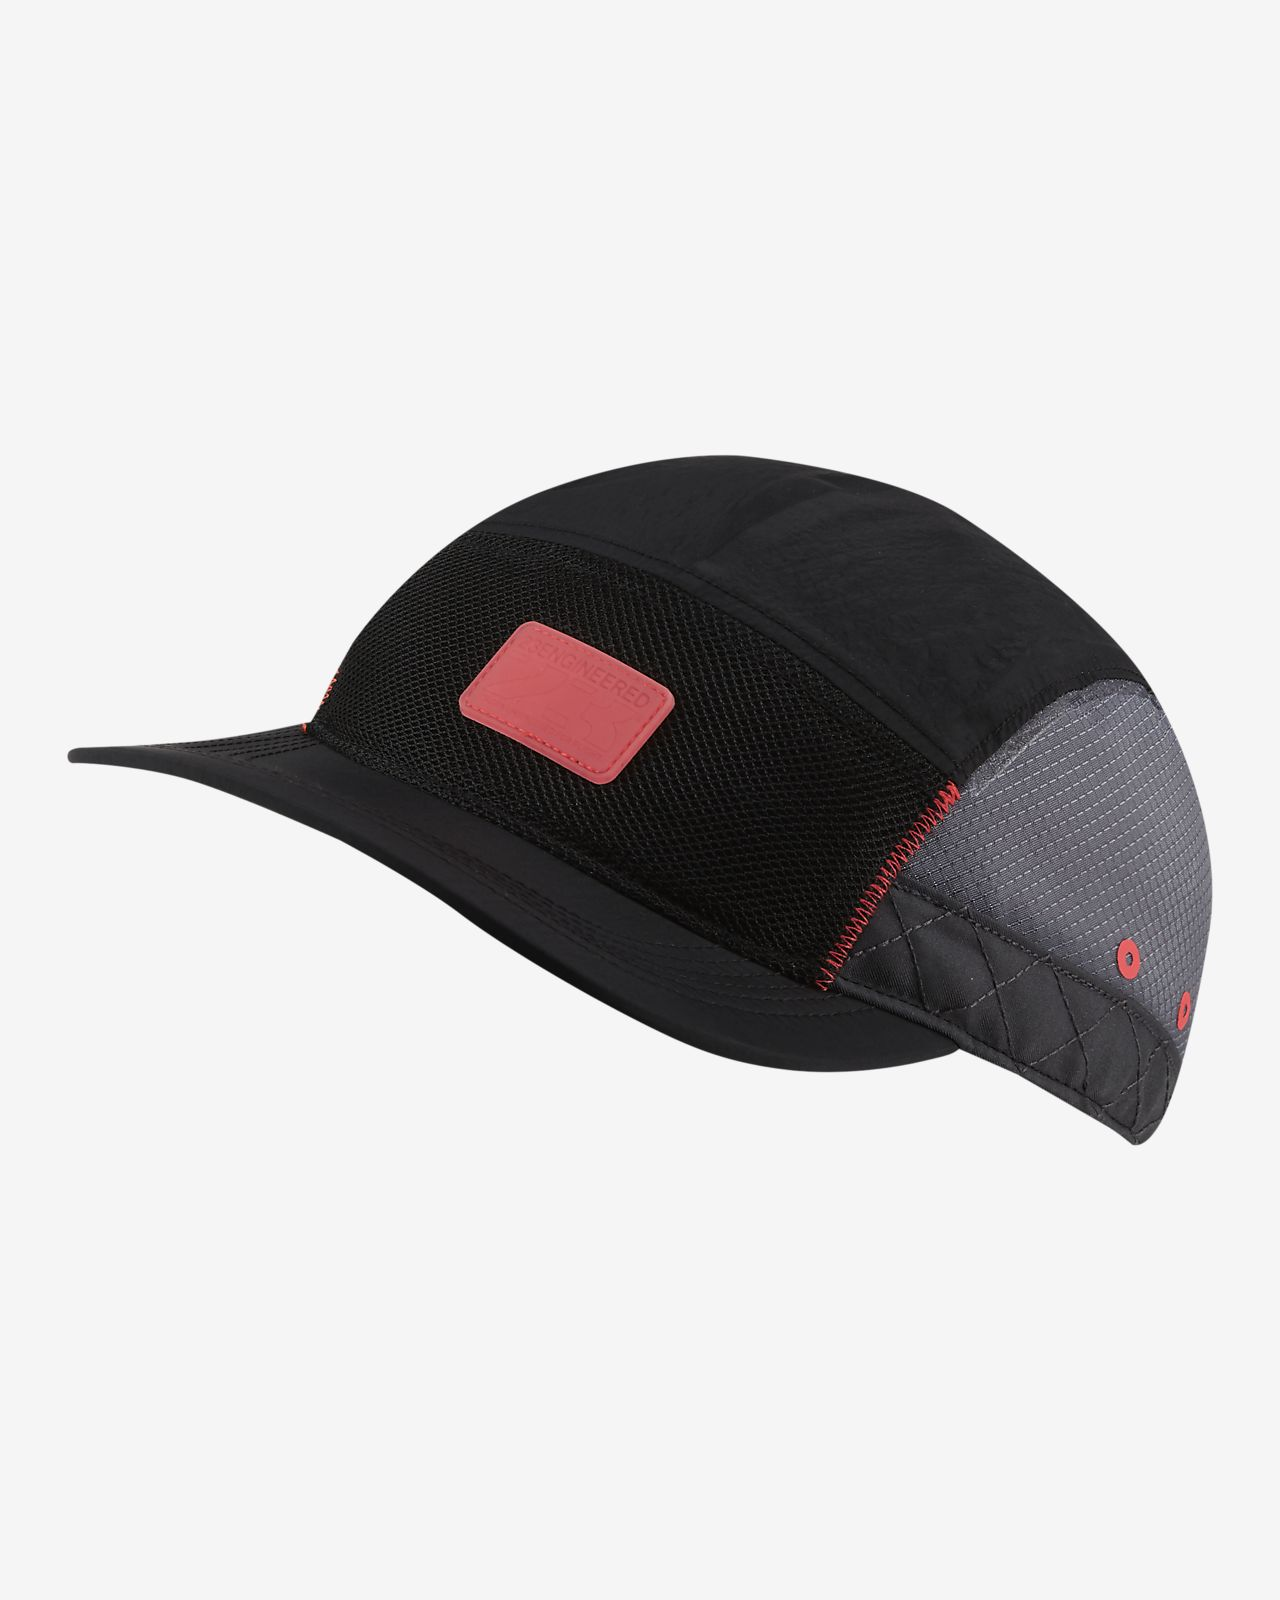 Jordan AW84 23 Engineered 帽款